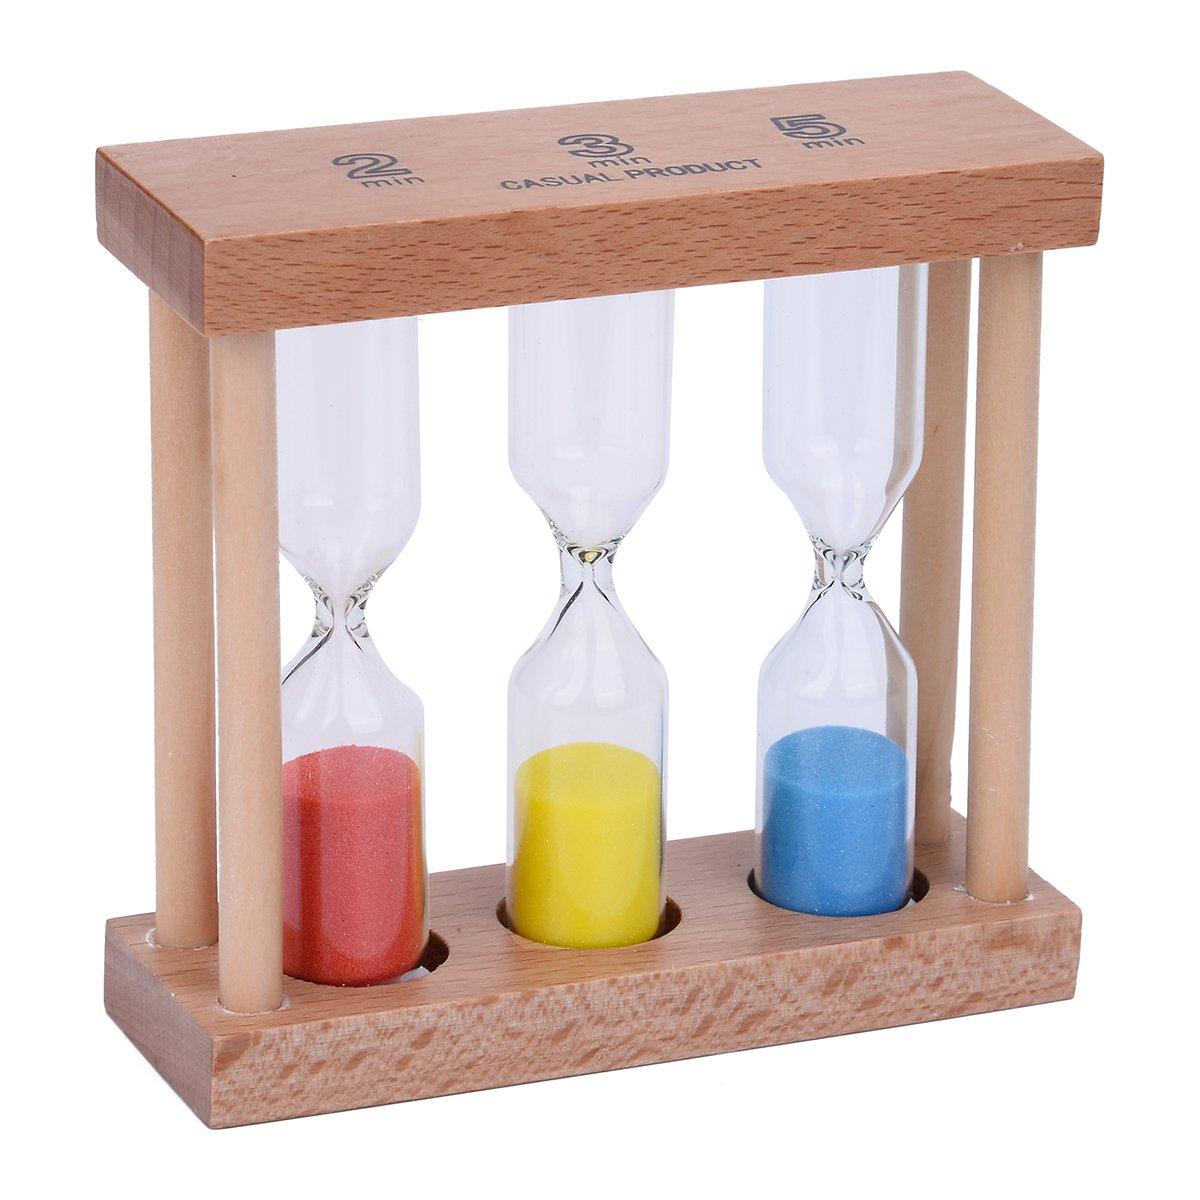 Sand timer design clessidra clessidra sabbia orologio timer legno Set 3/pz Color 2-2//3//5 Min